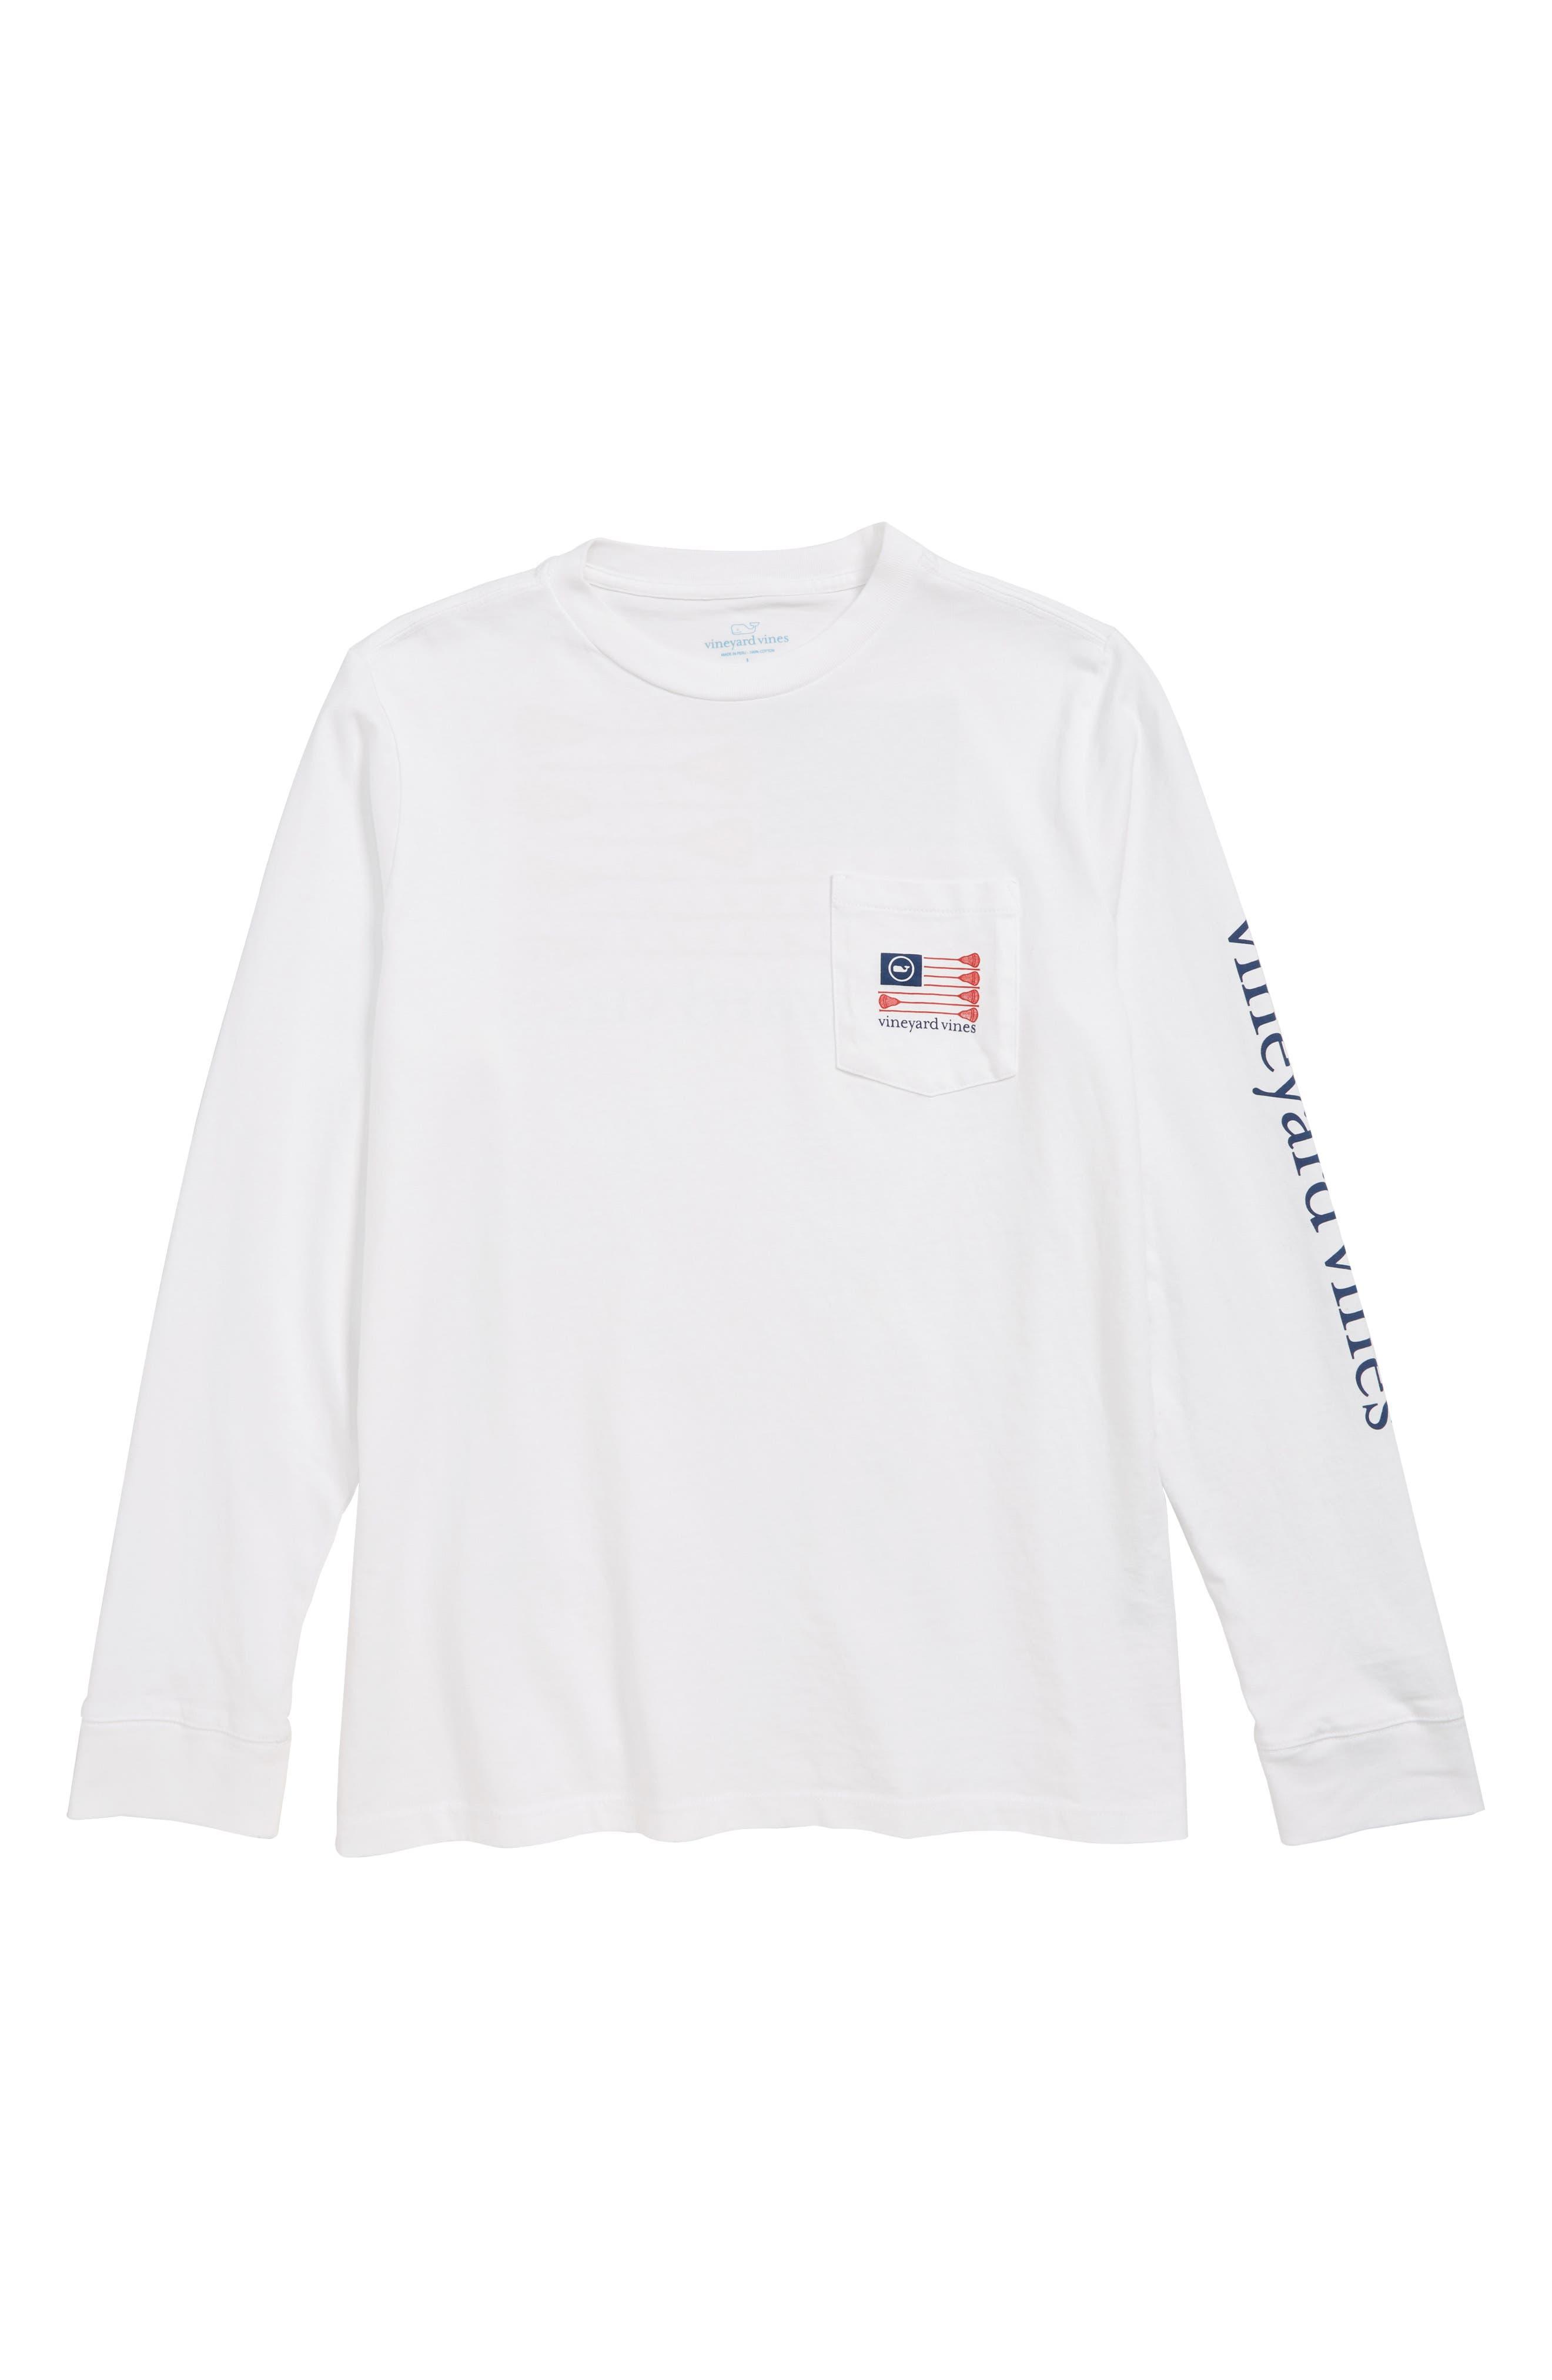 VINEYARD VINES Lacrosse Flag Pocket T-Shirt, Main, color, 100